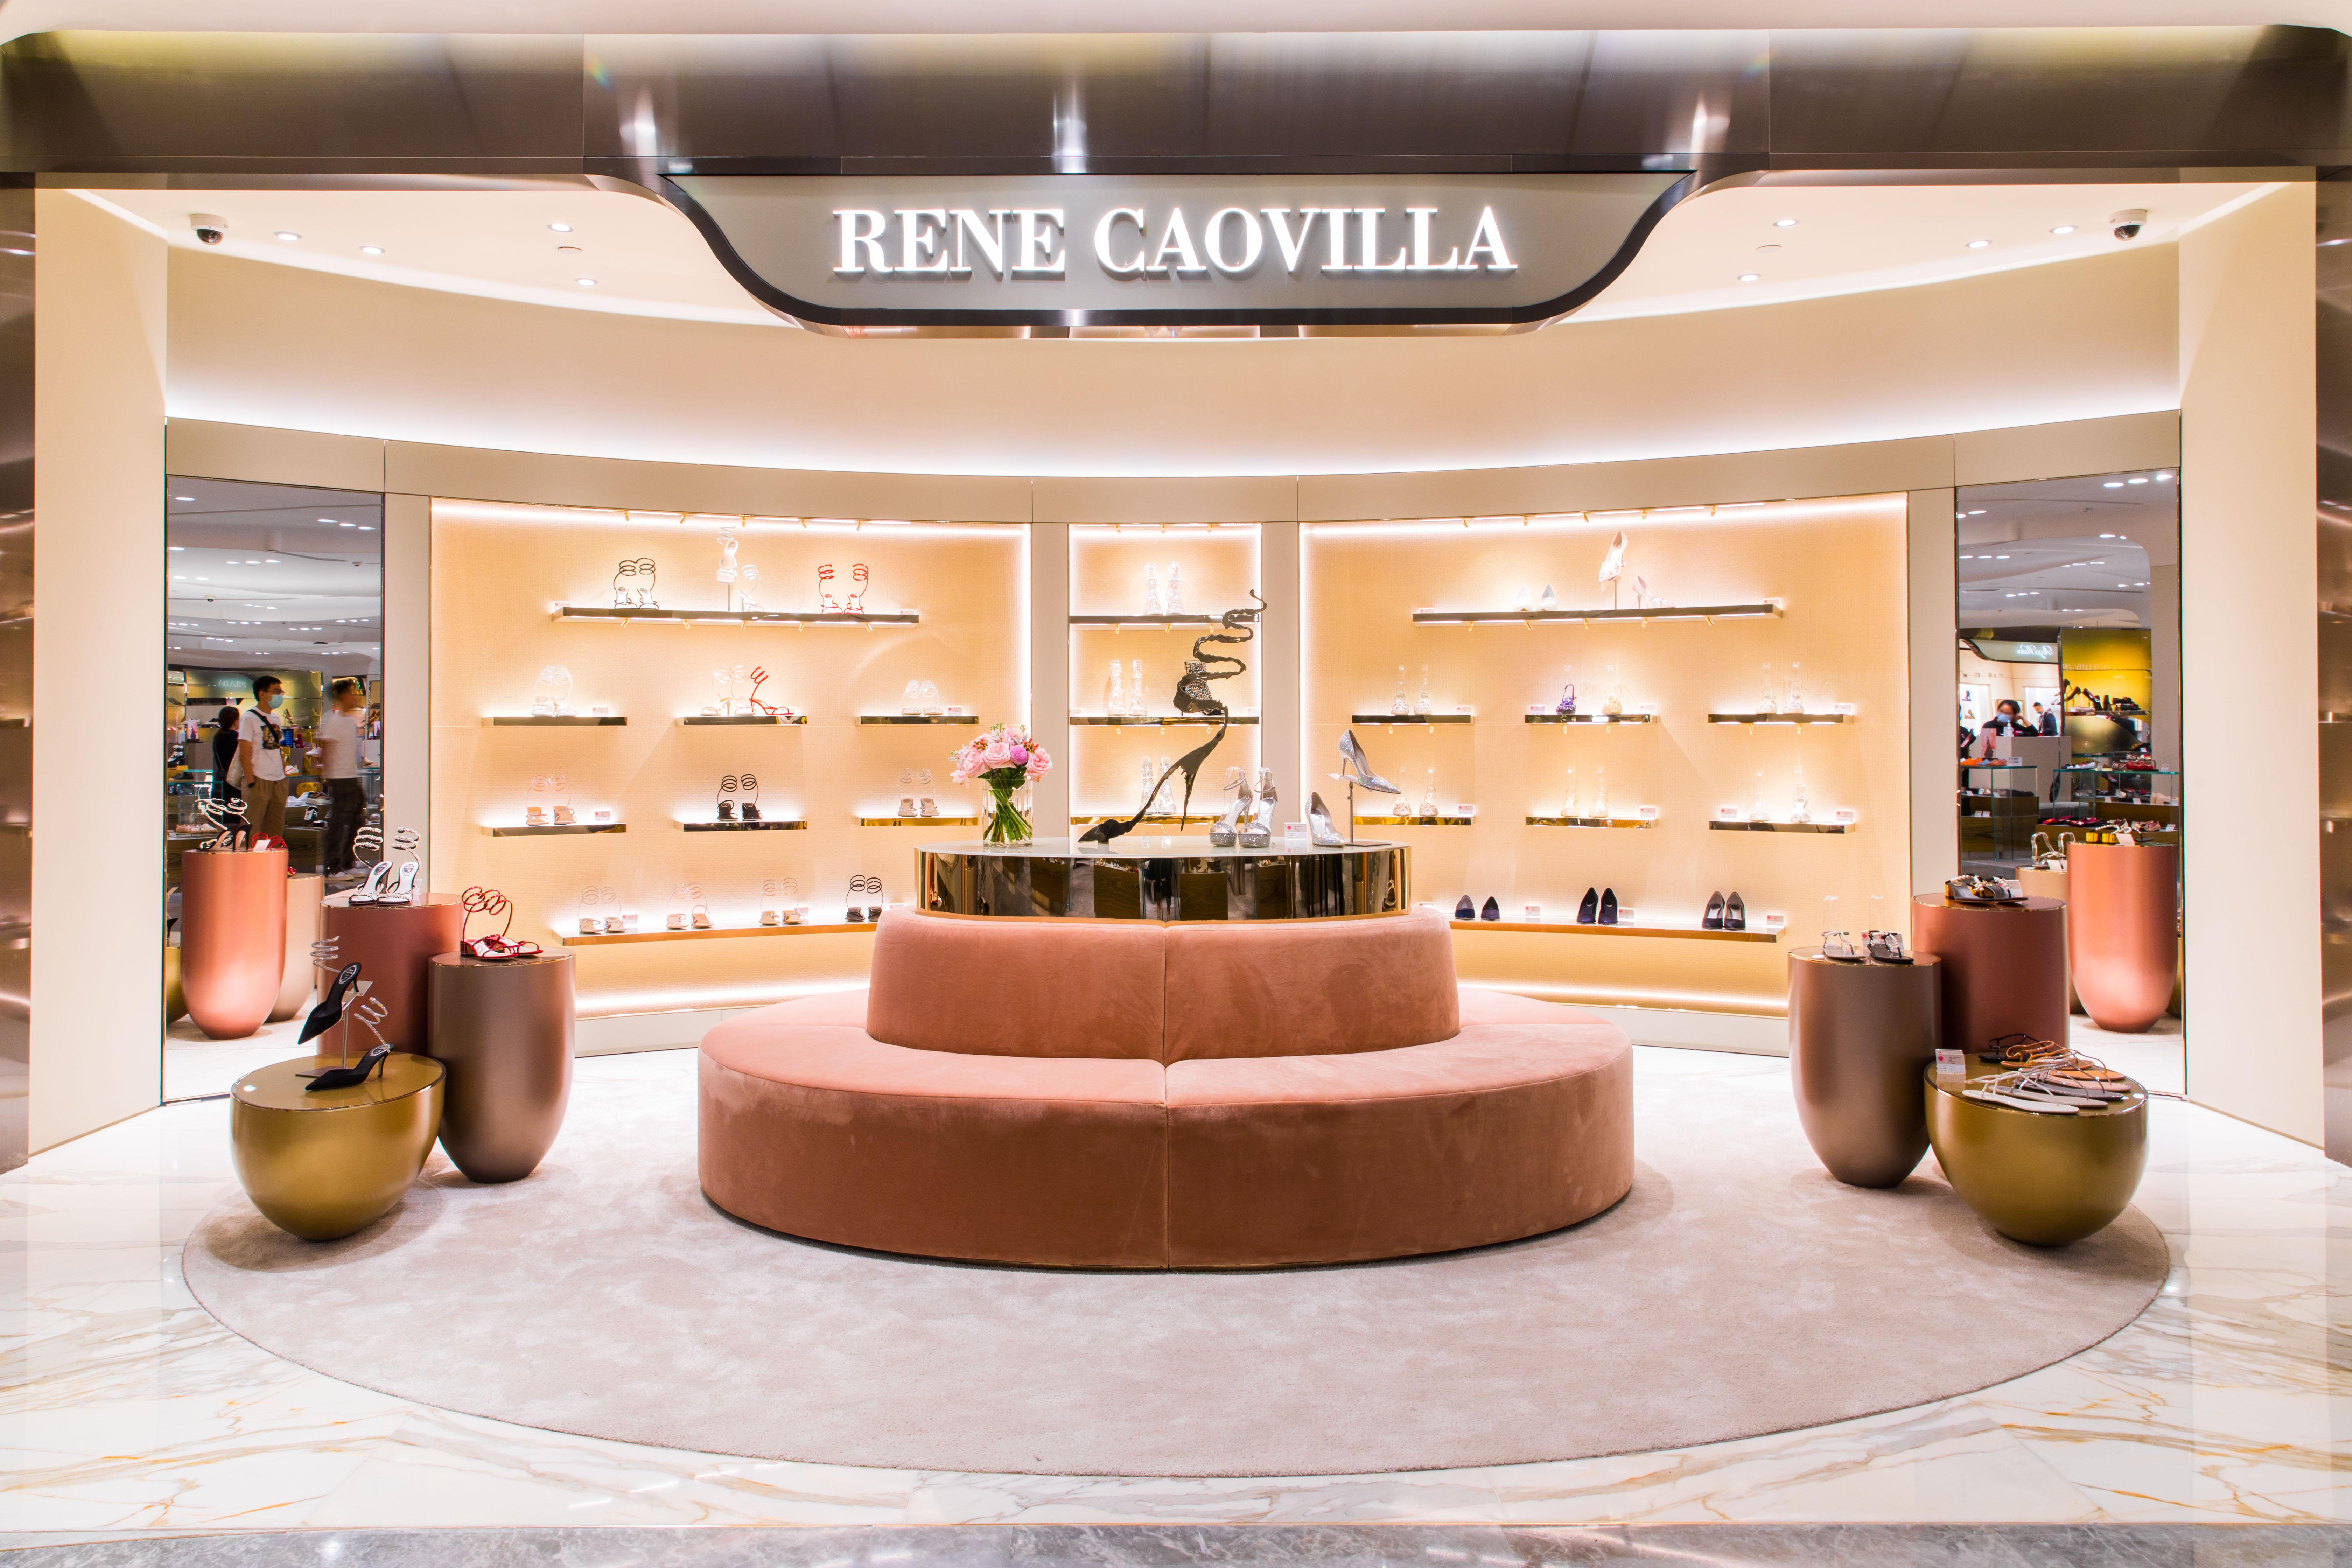 René Caovilla Makes Retail Investments